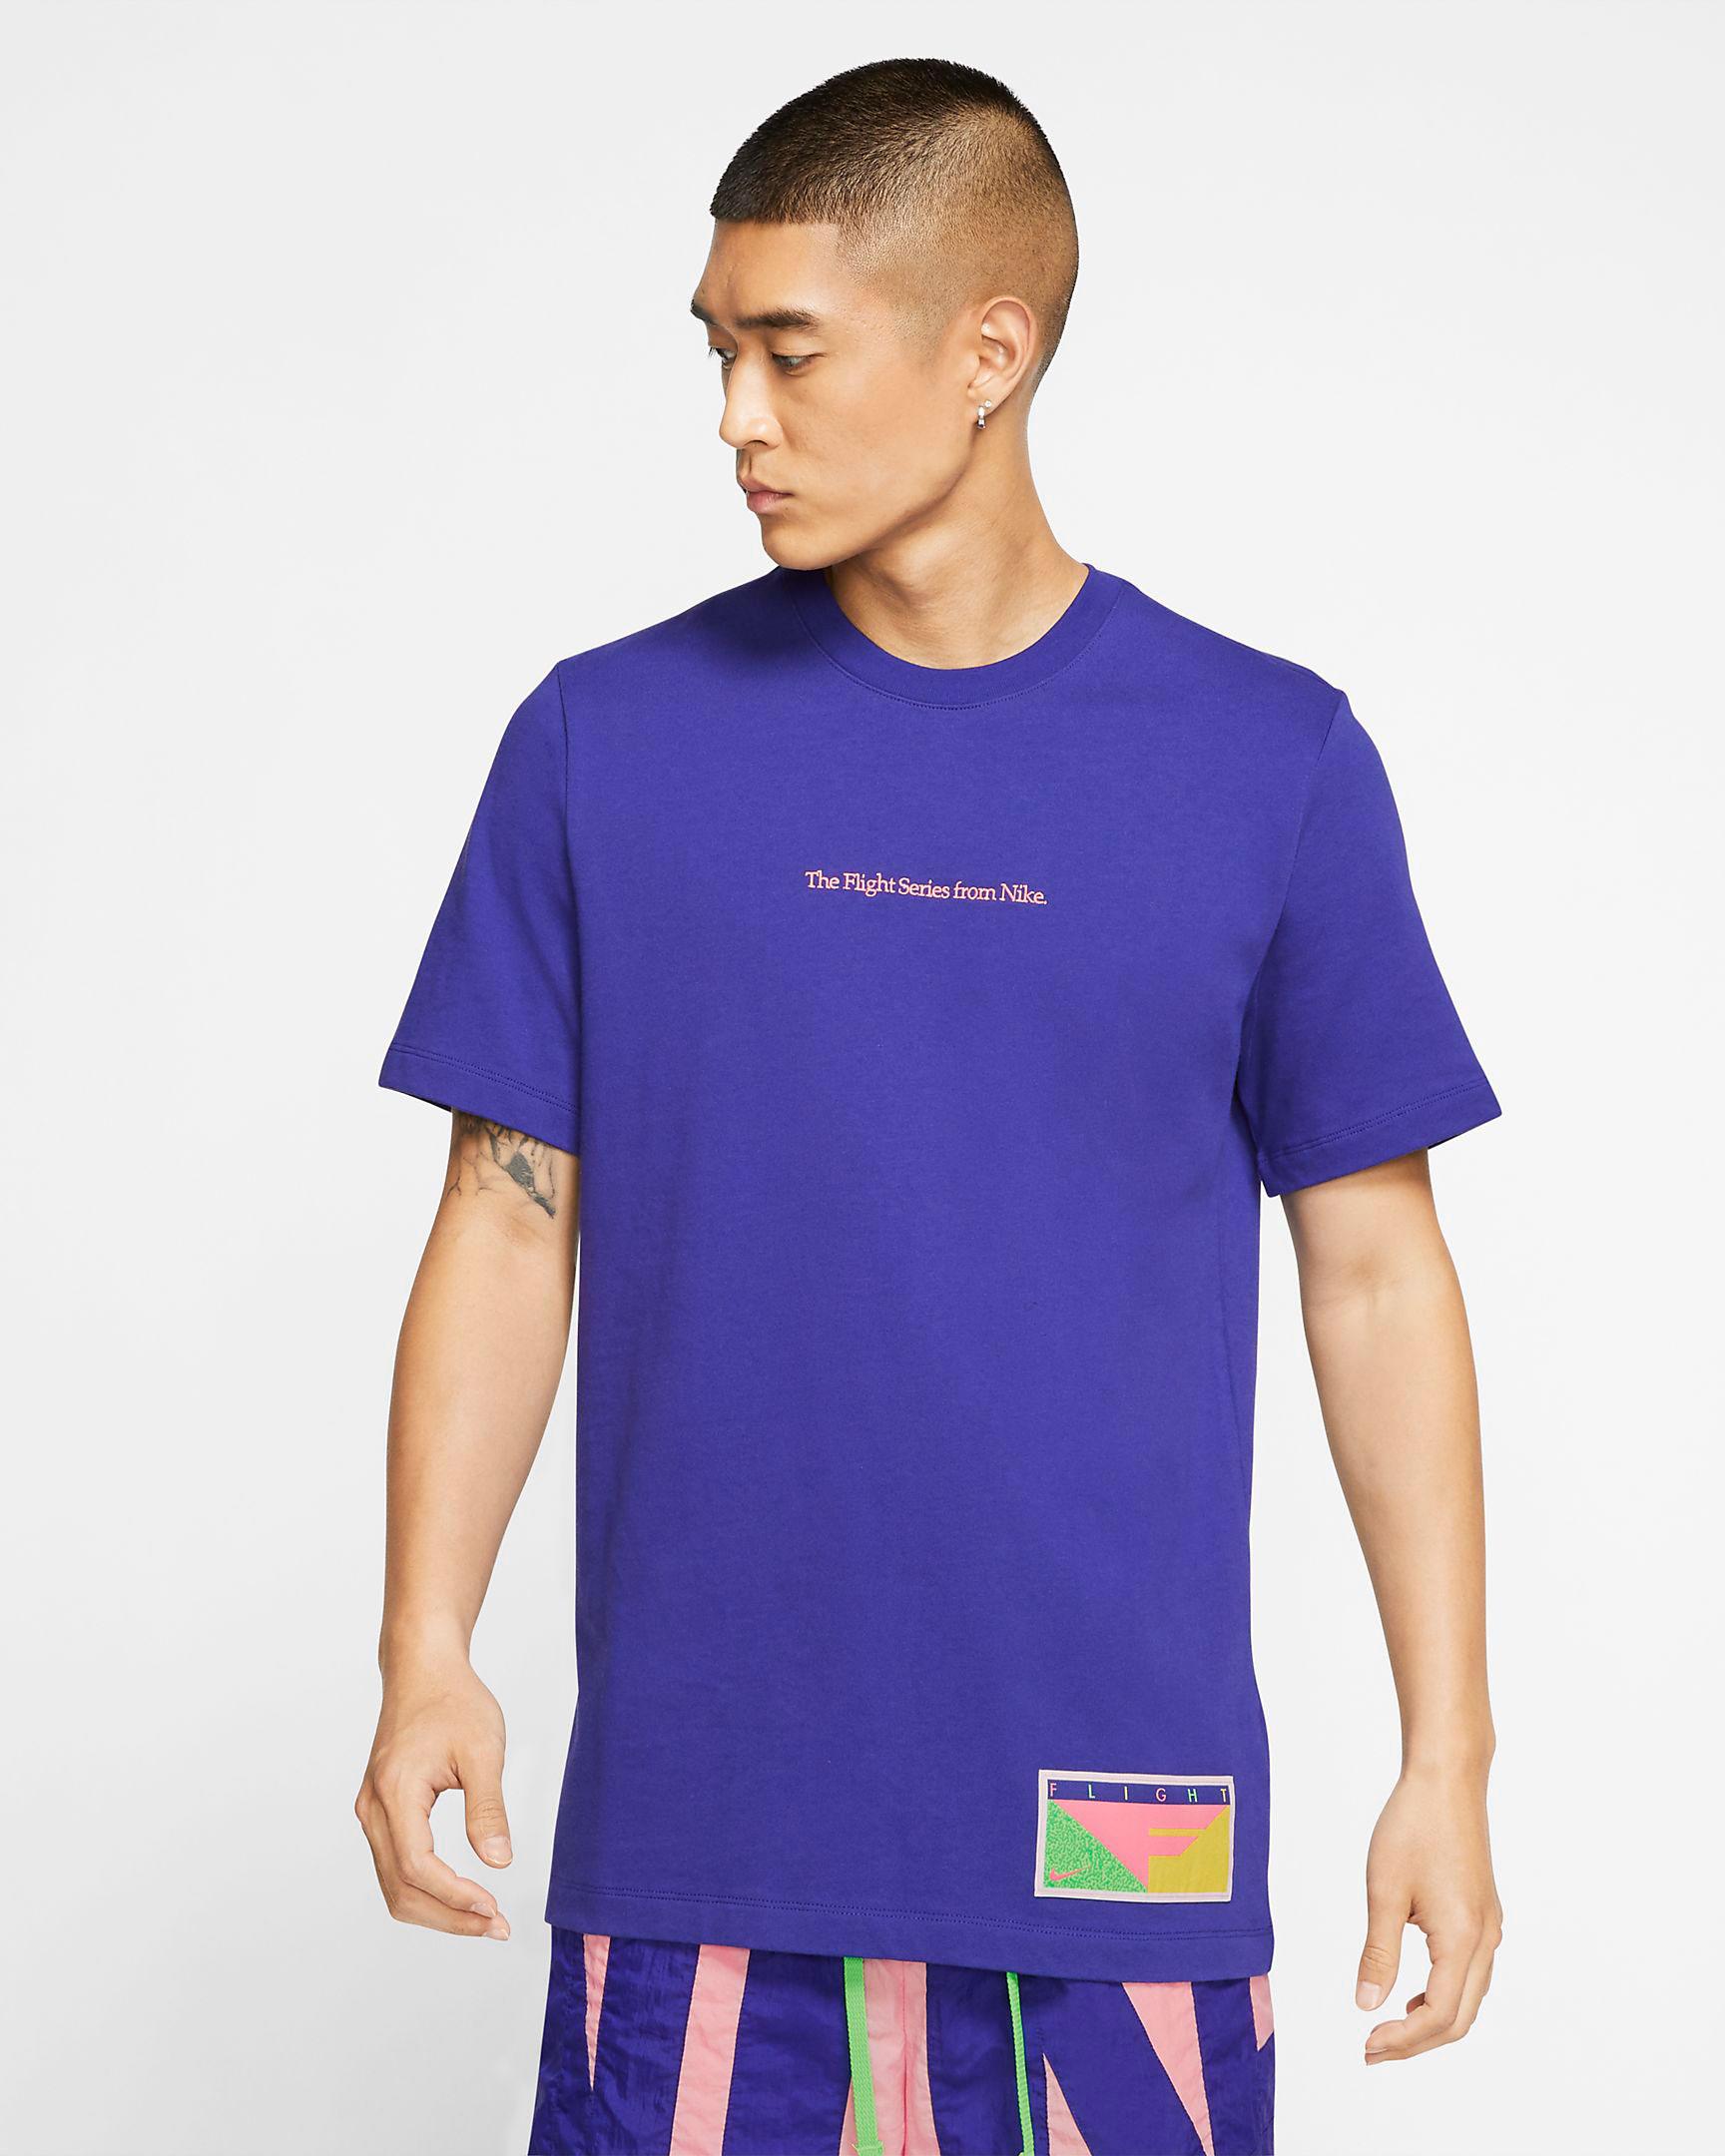 nike-flight-shirt-purple-pink-1